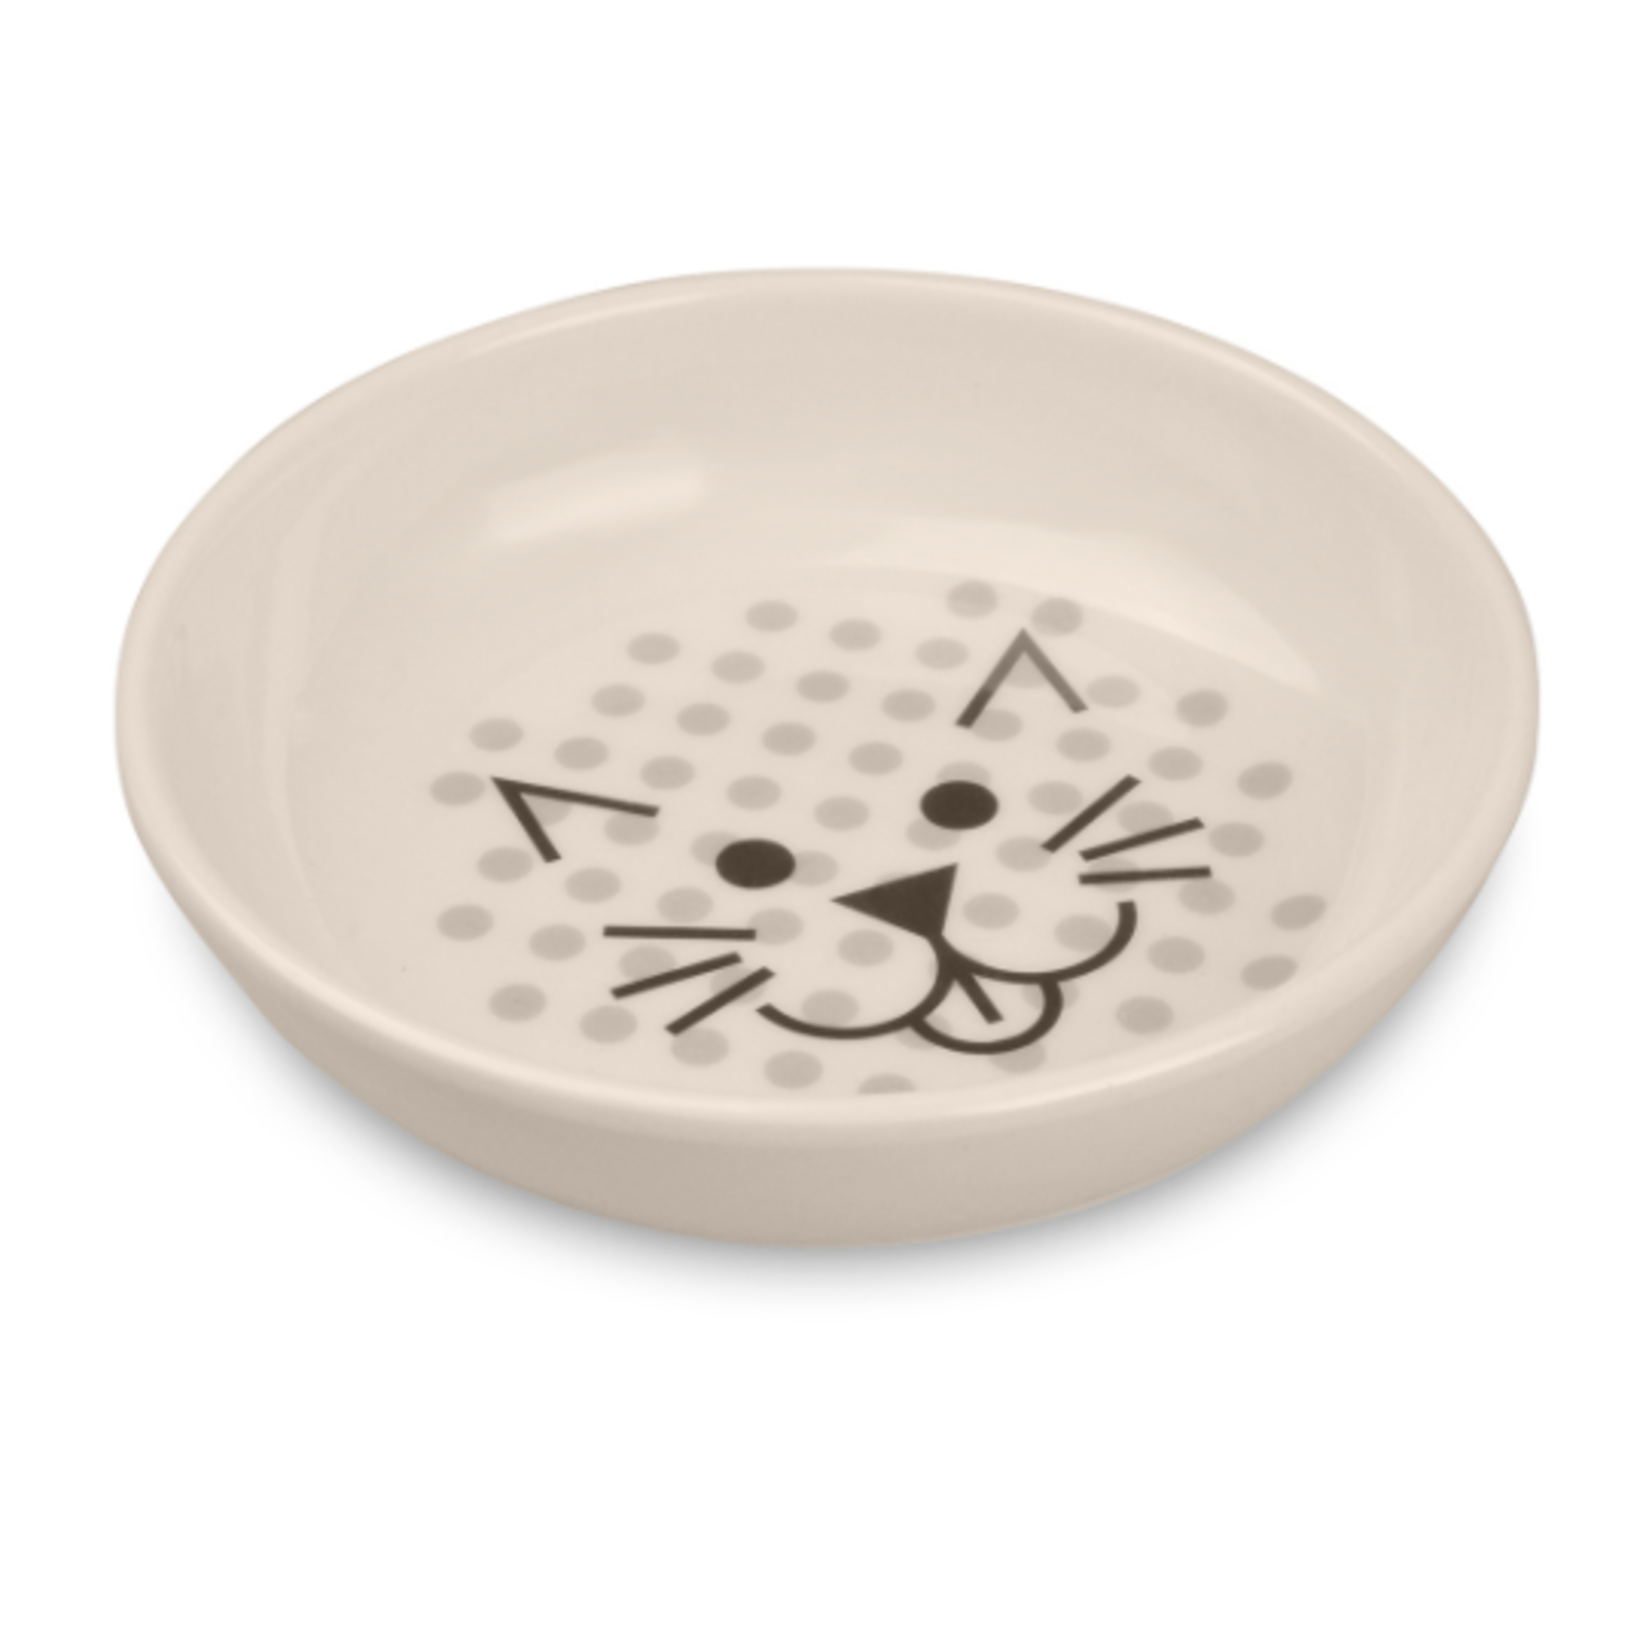 "Van Ness ""Ecoware"" Cat Dish, 8 fl. oz"